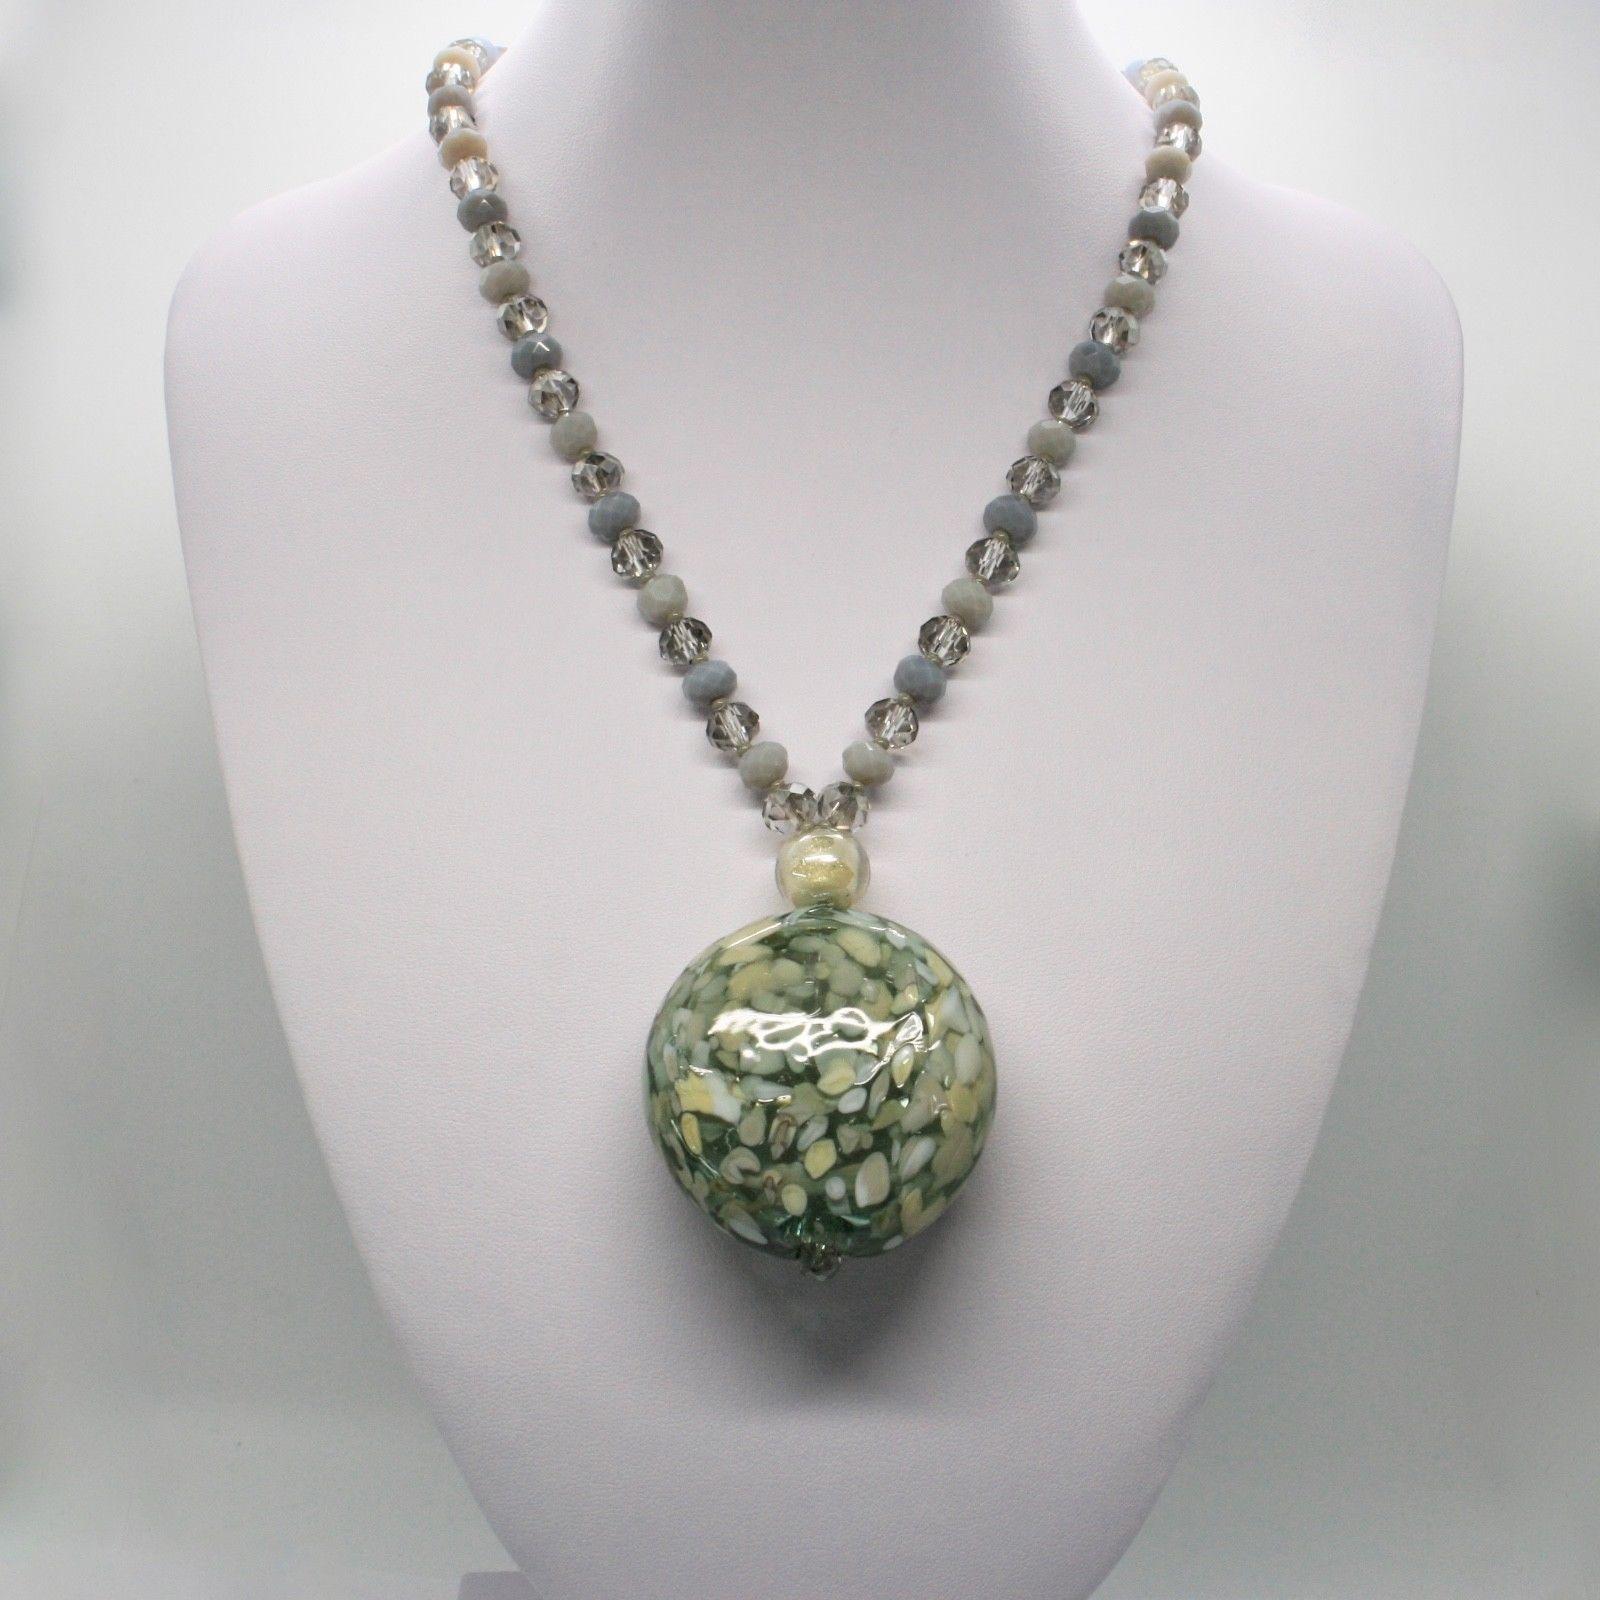 ANTICA MURRINA VENEZIA NECKLACE WITH MURANO GLASS GOLD BEIGE GREY COA76A34